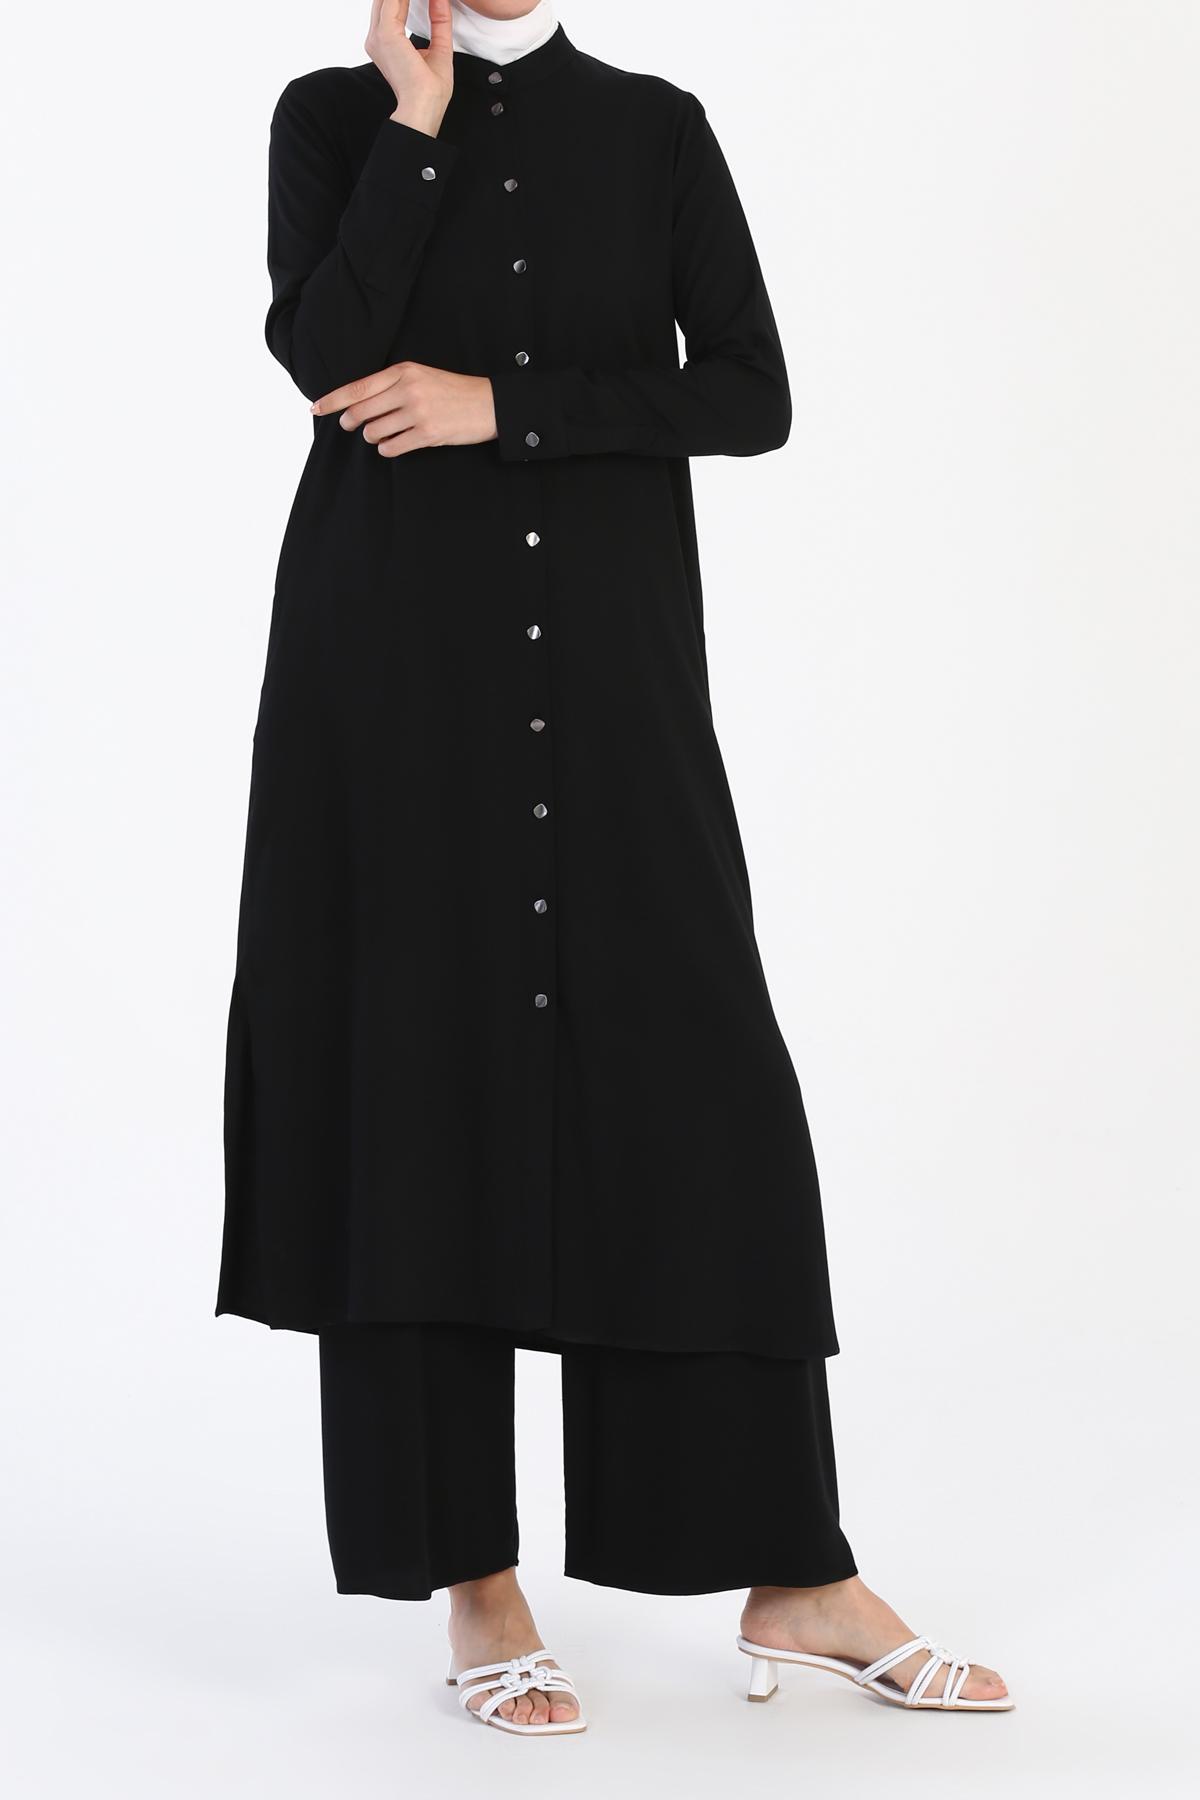 Uzun Tunikli Pantolonlu Viskon Takım